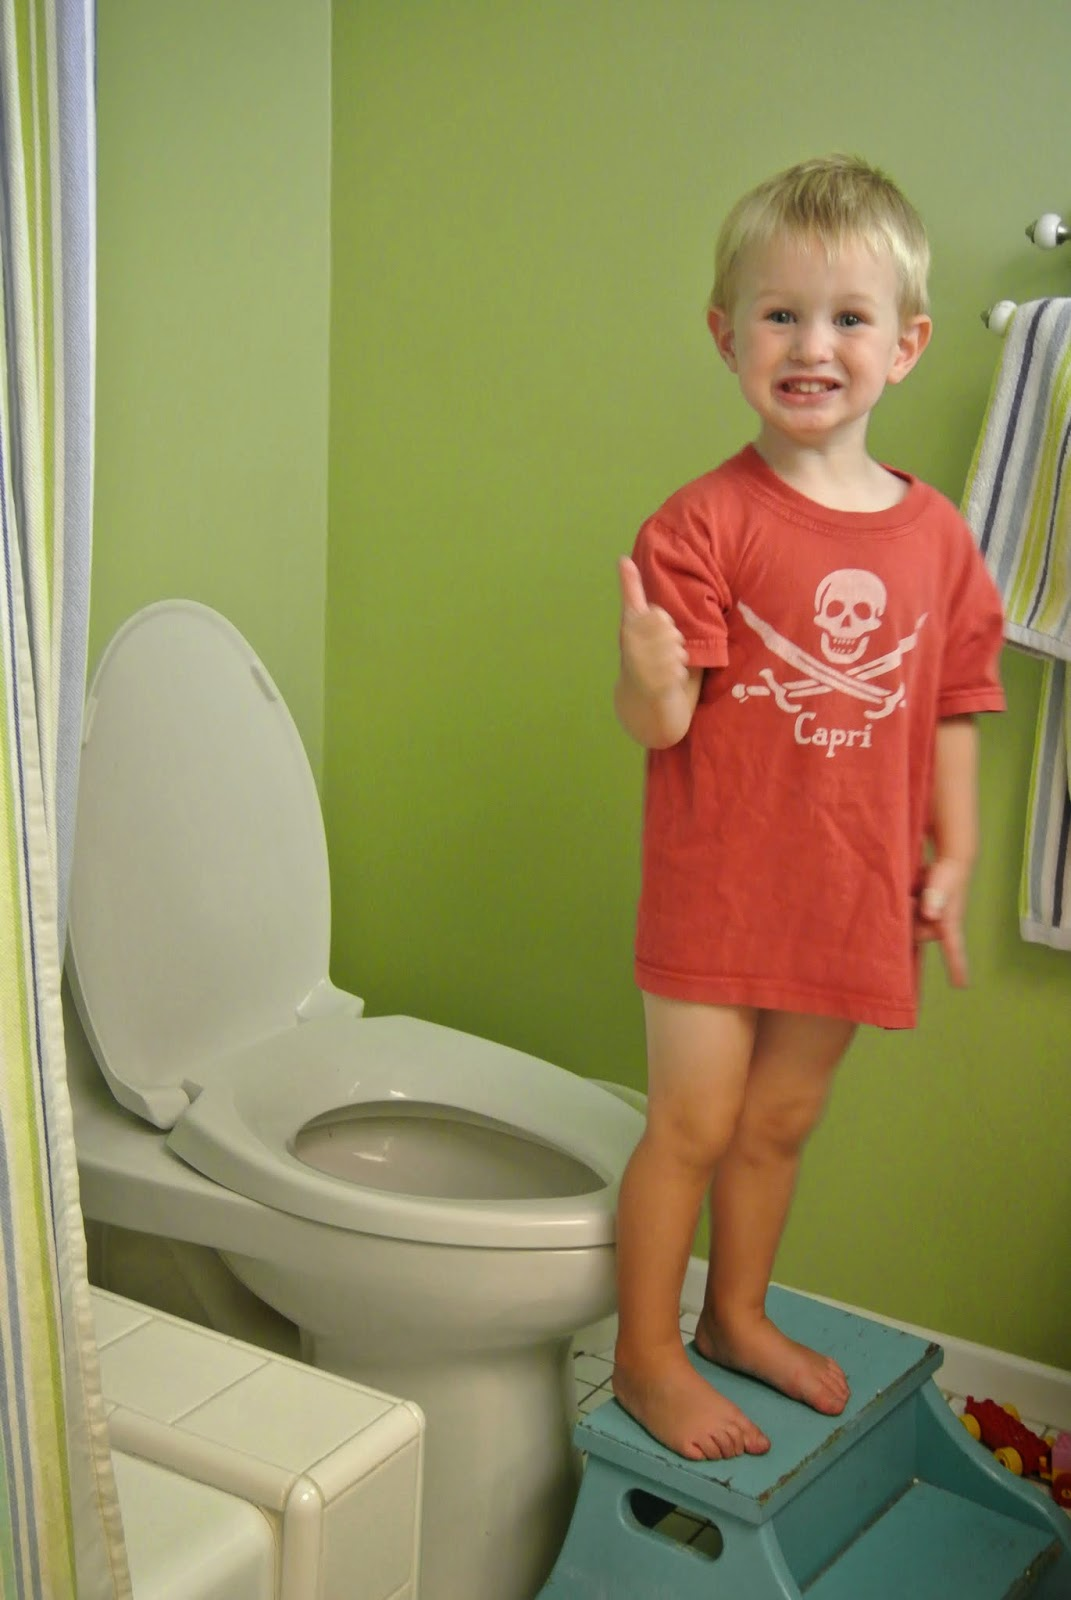 Ha peeing potty toilet